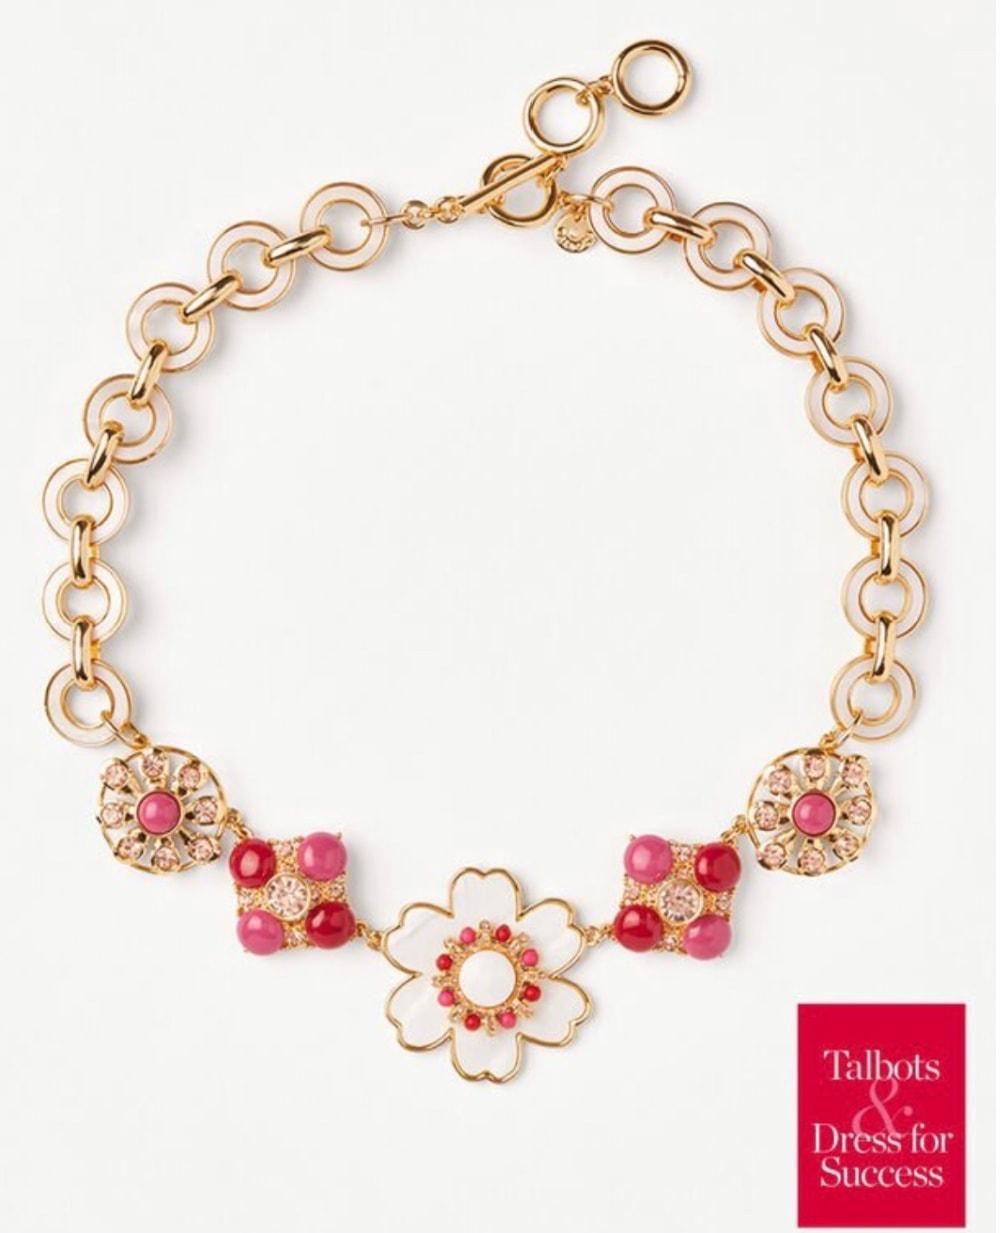 talbots gratitude necklace